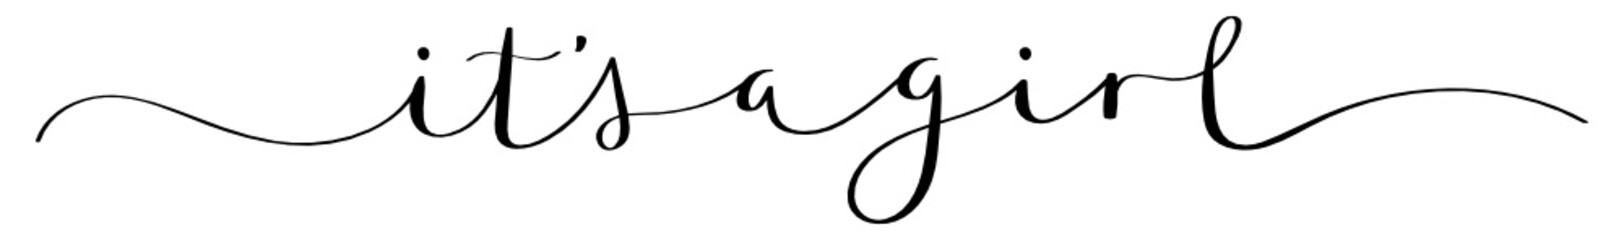 IT'S A GIRL black brush calligraphy banner